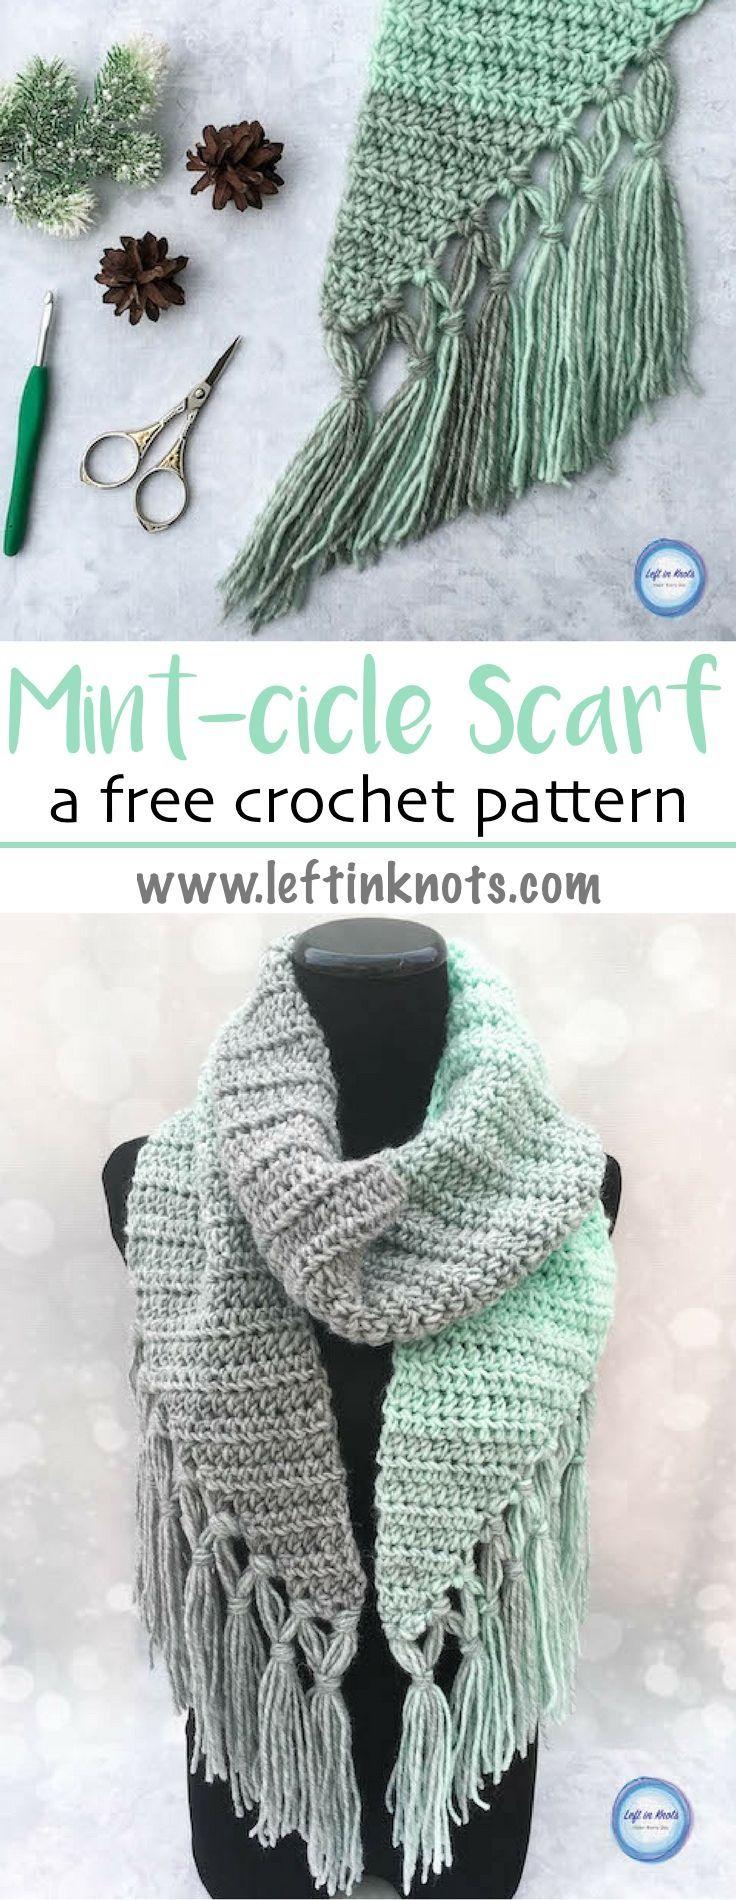 Mint-cicle Scarf Crochet Pattern | Tejido, Ganchillo y Chal